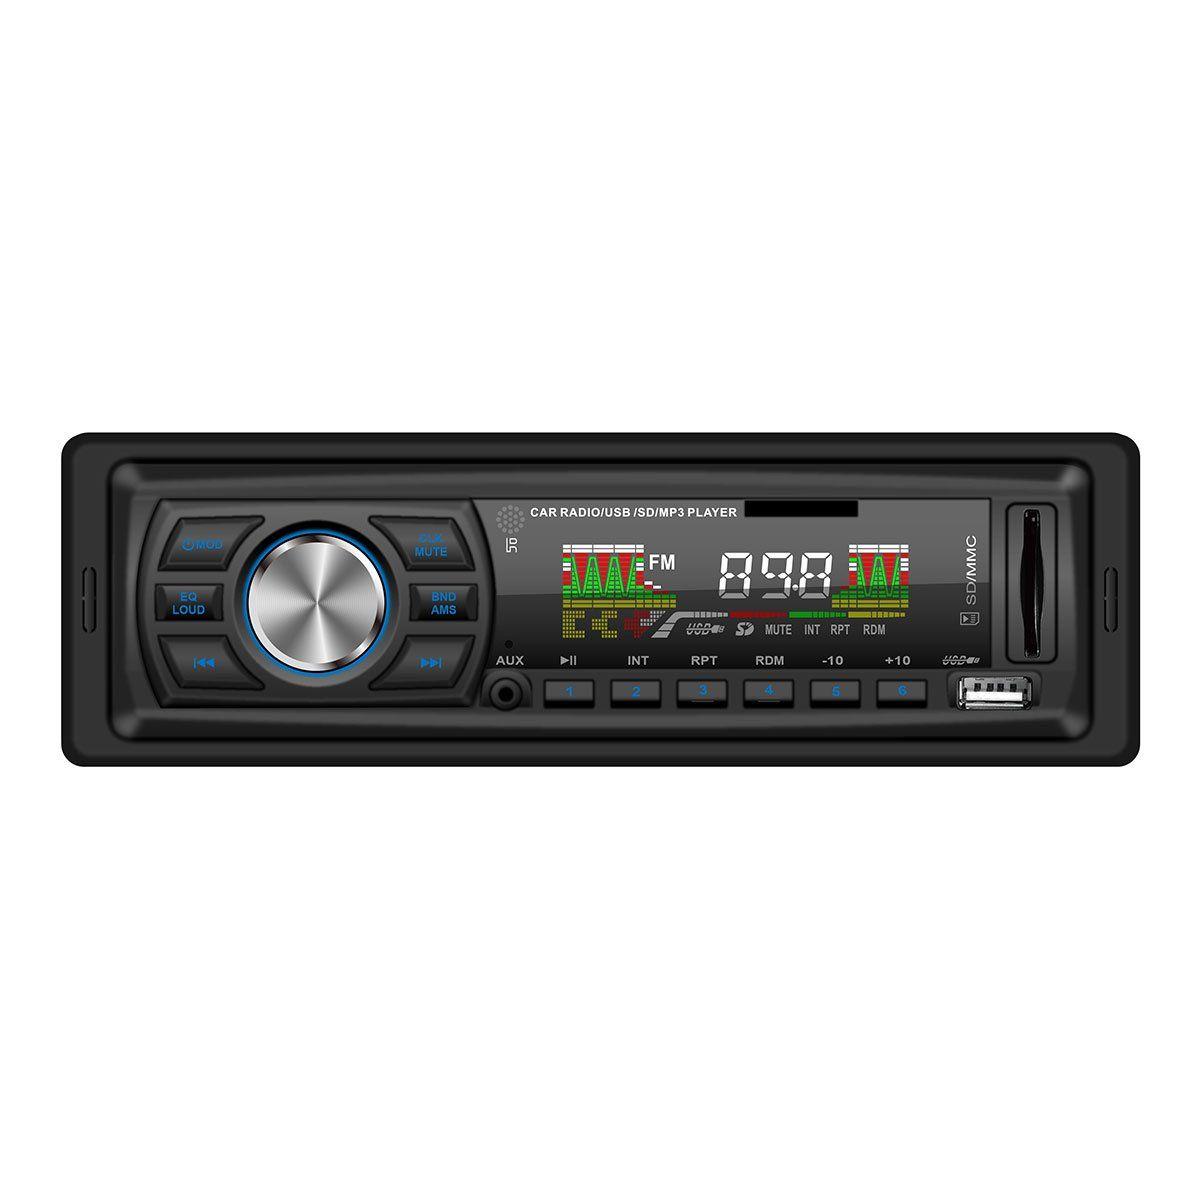 masione 12v fm receiver car audio stereo mp3 radio player masione 12v fm receiver car audio stereo mp3 radio player usb sd input